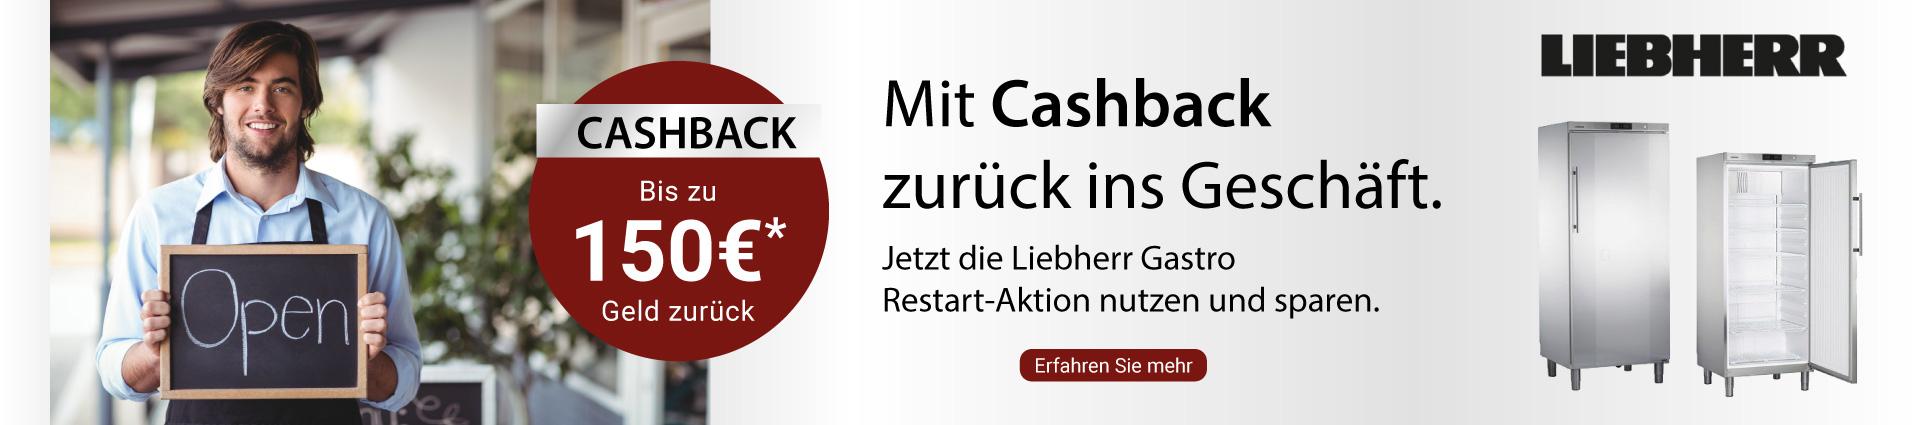 LIEBHERR Cashback-Aktion